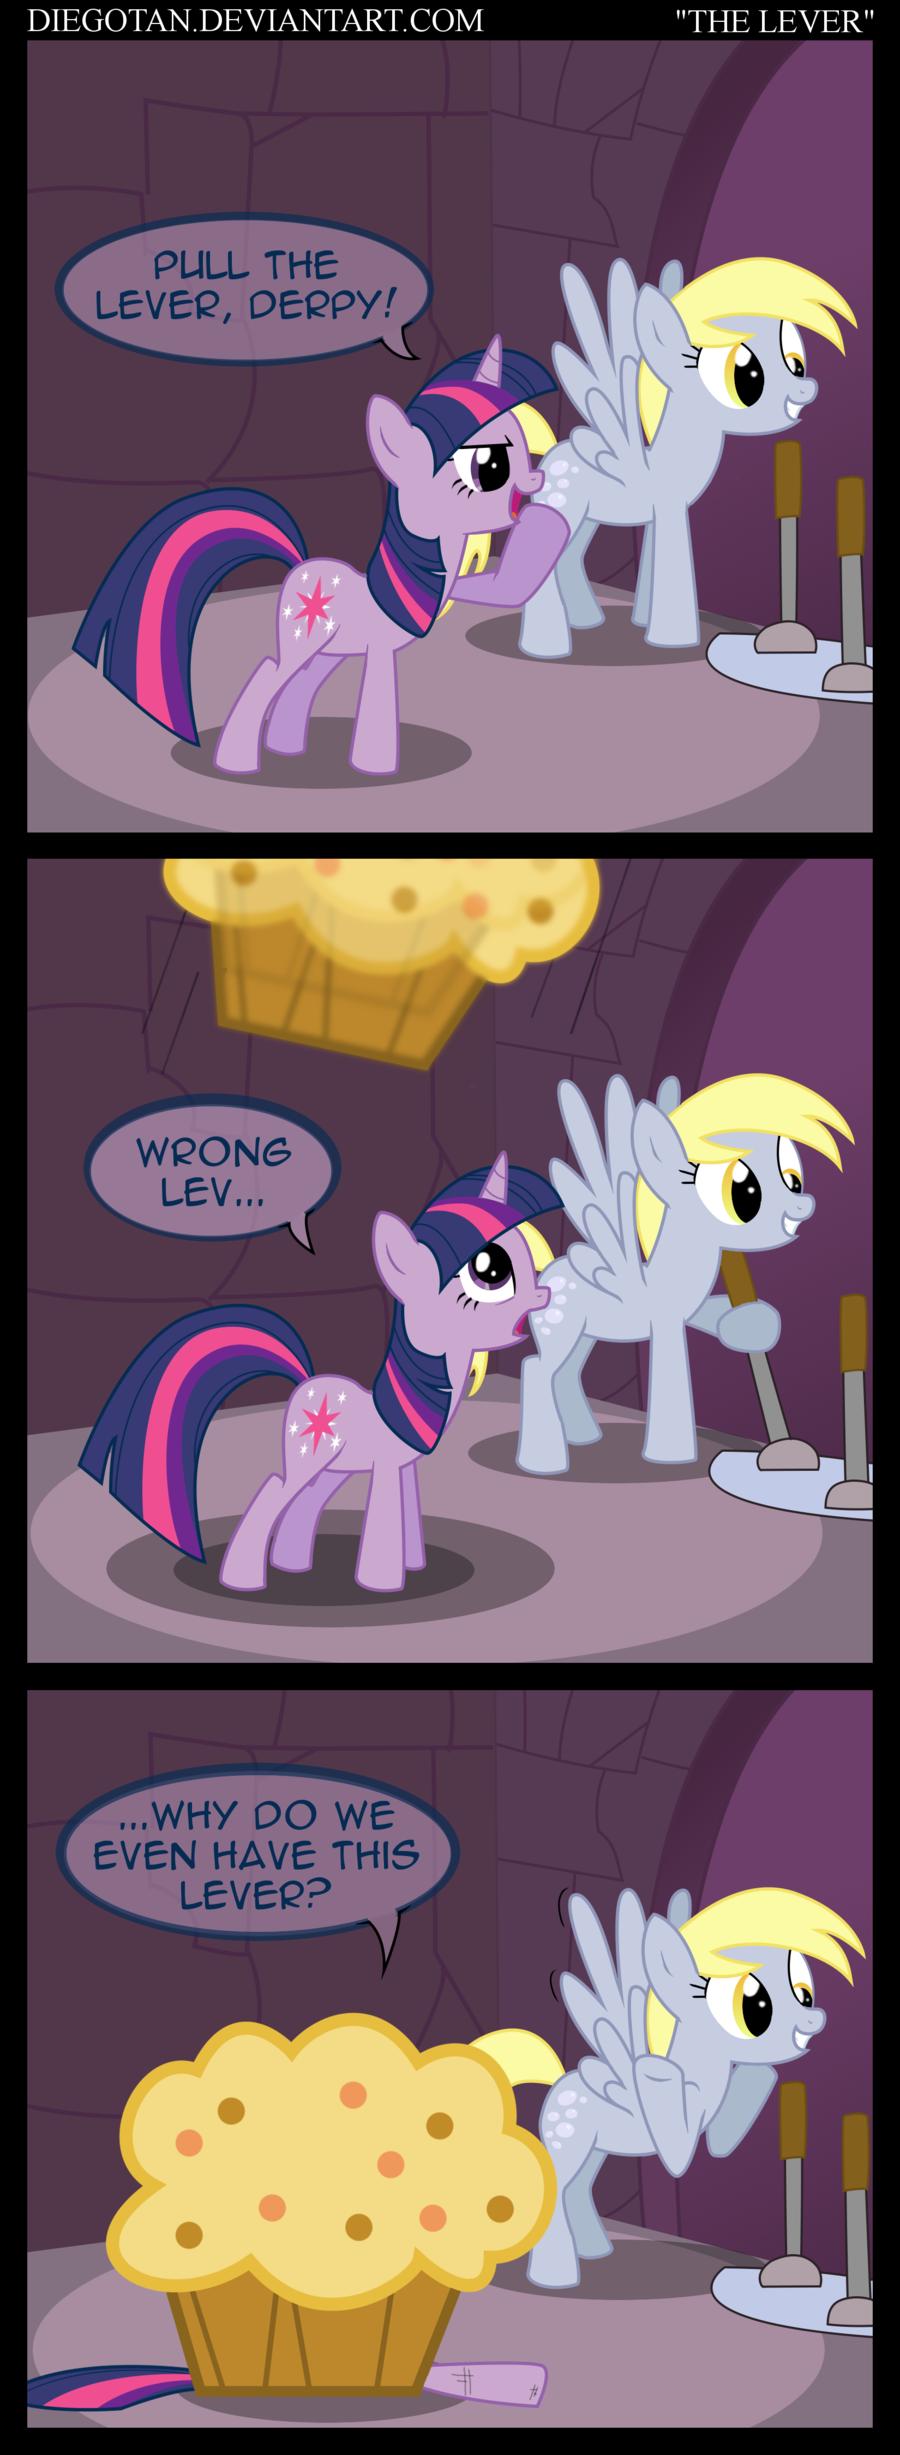 "Pull the Lever. diegotan.deviantart.com/ be welcome to visit.. DIEGOTAN. DEVIANTA RT. COM ""THELASER "" the lever diegotan comic ponies"